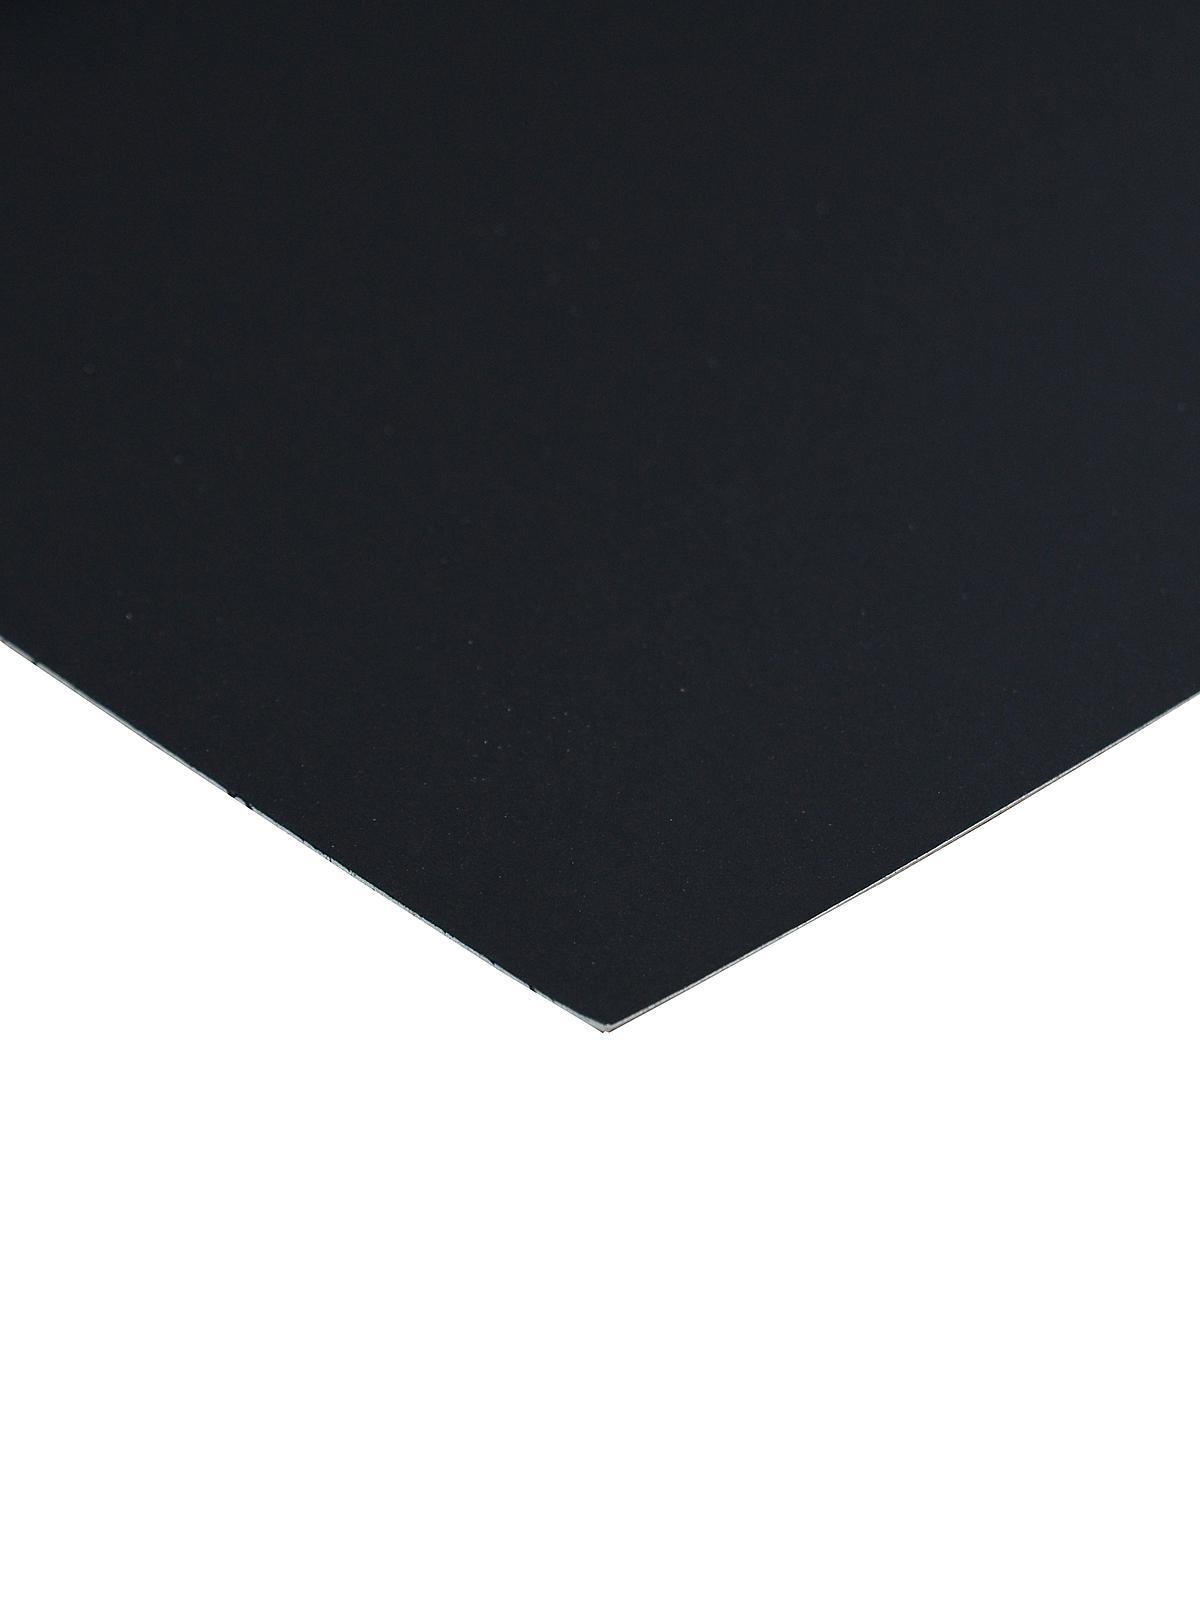 international moulding x mat core bainbridge florence mist mats gray black ky productshowroom board